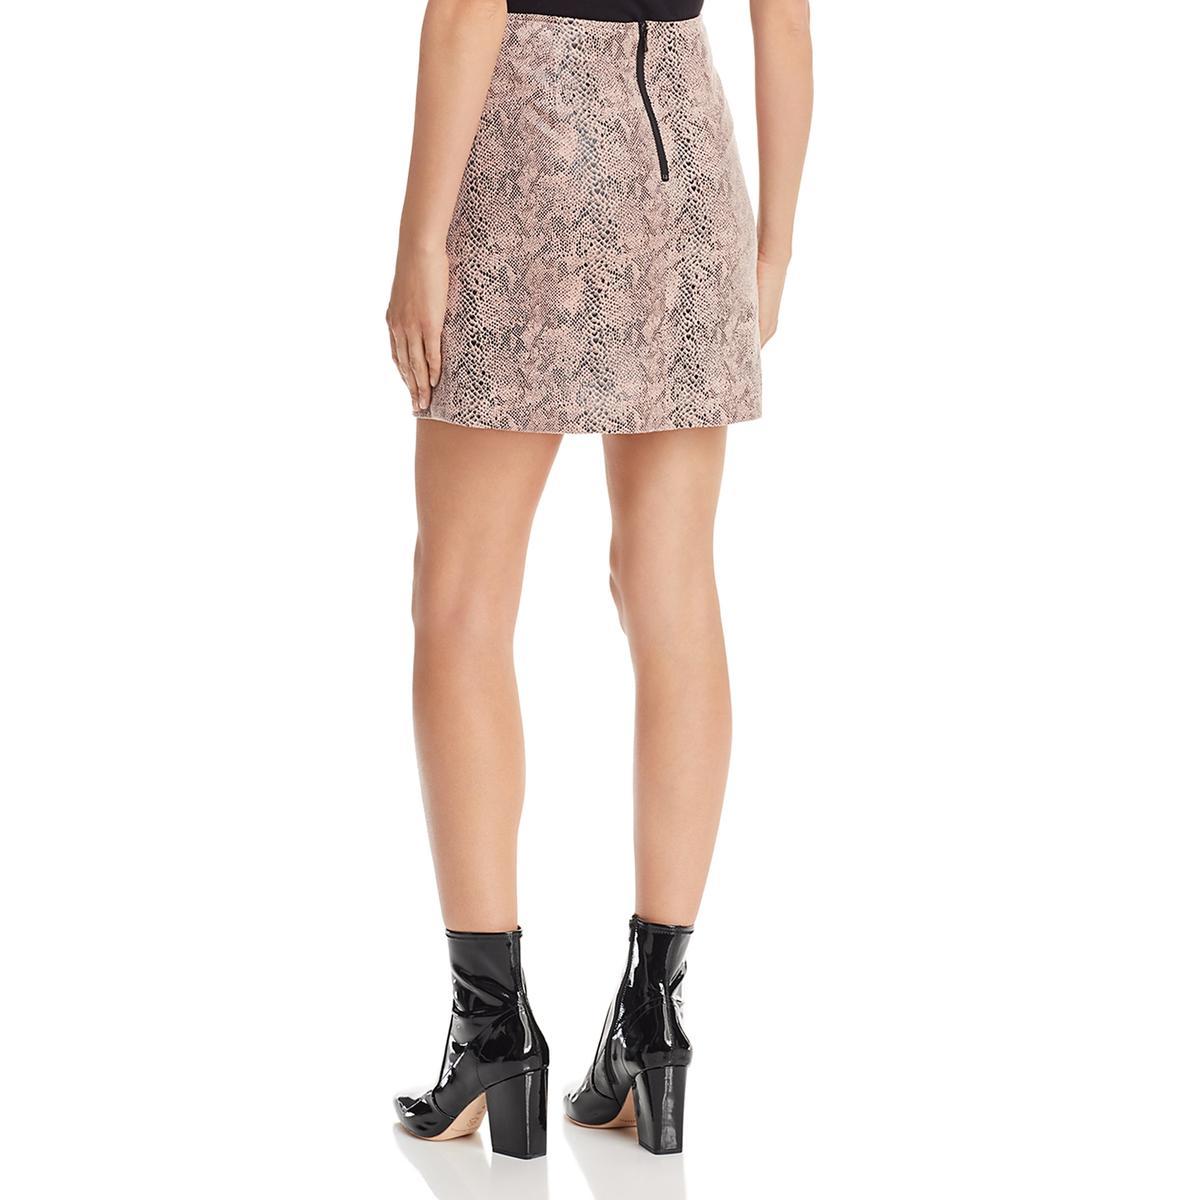 M.N.I Los Angeles Womens Pink Faux Suede Snake Print Mini Skirt XS BHFO 4194